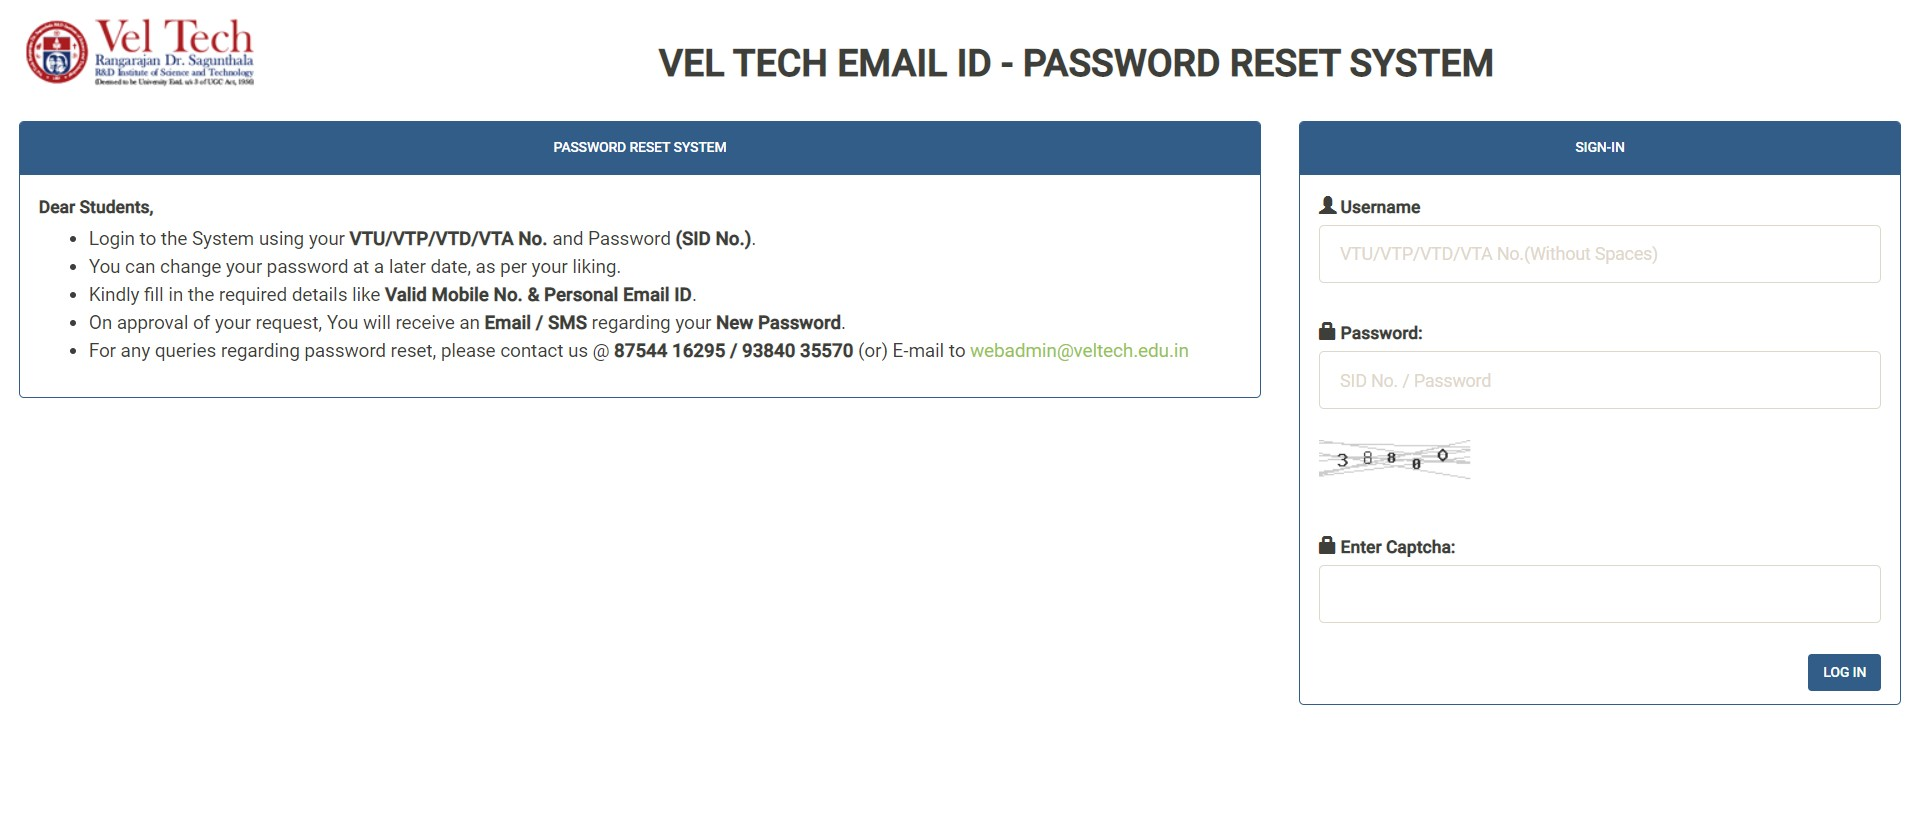 Vel Tech email id password reset